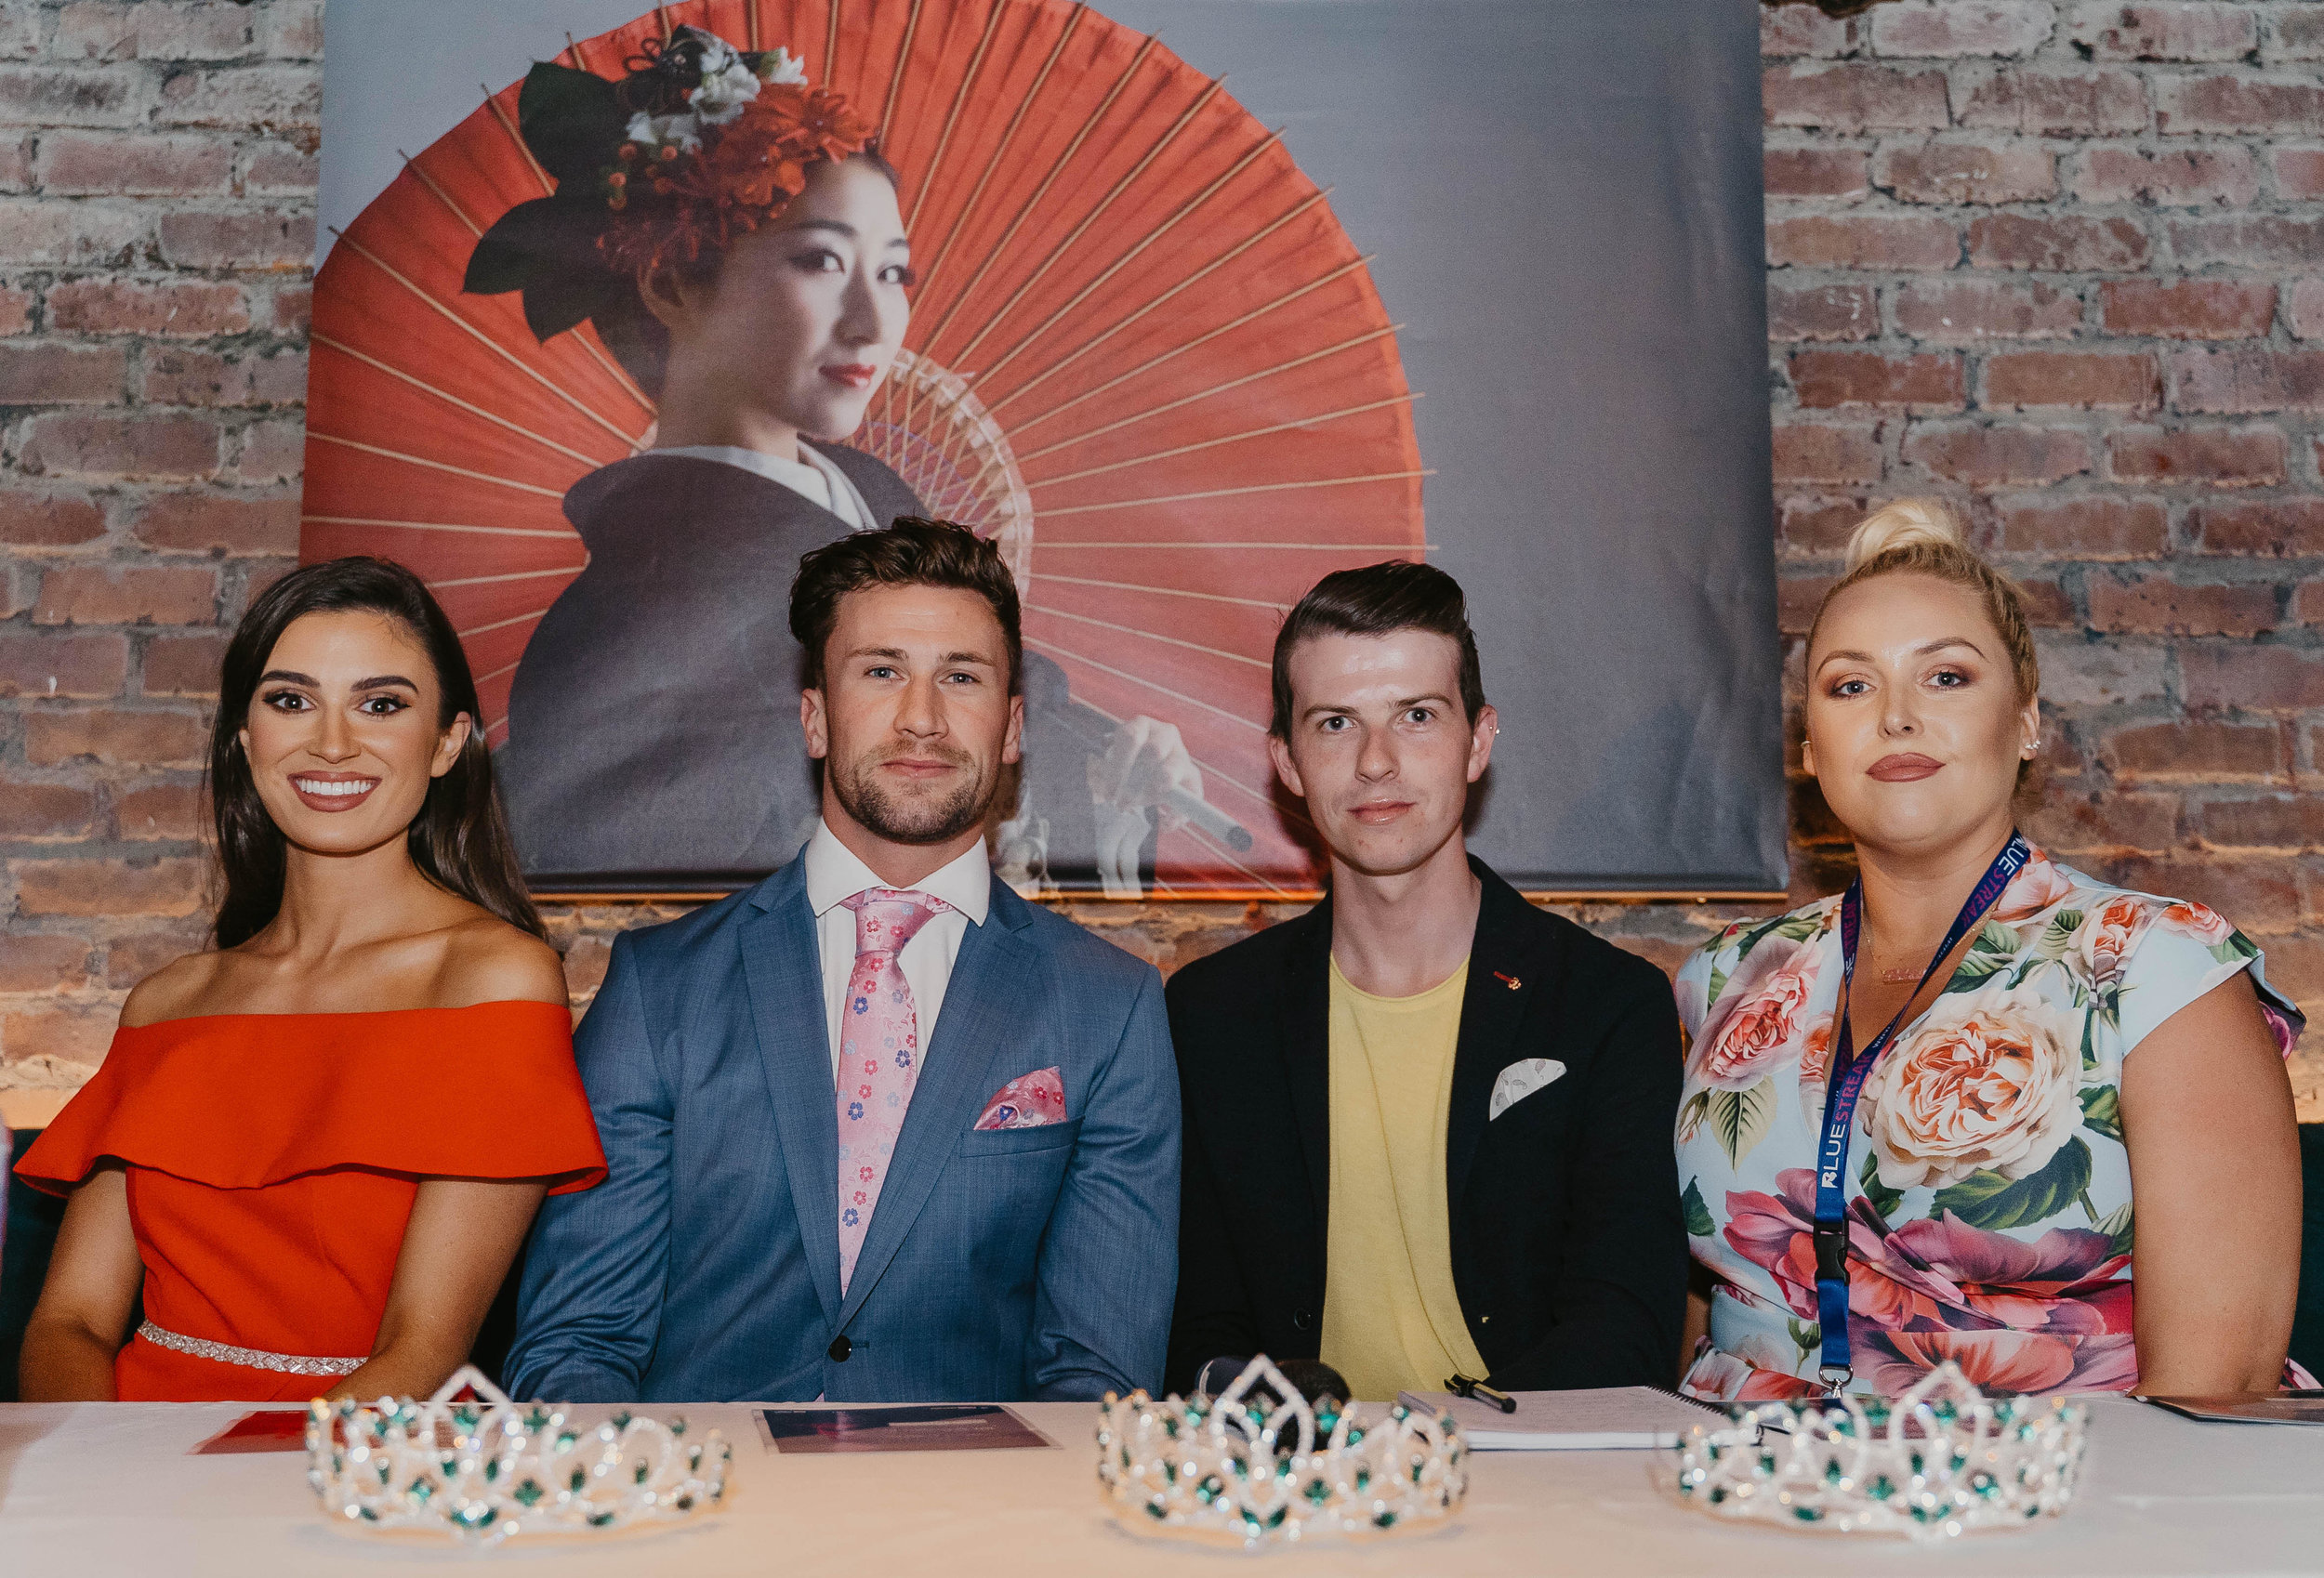 Miss Ireland 2018 Aoife O'Sullivan, Mr Ireland Wayne Walsh, Mikie O'Loughlin & Sinead O'Brien.